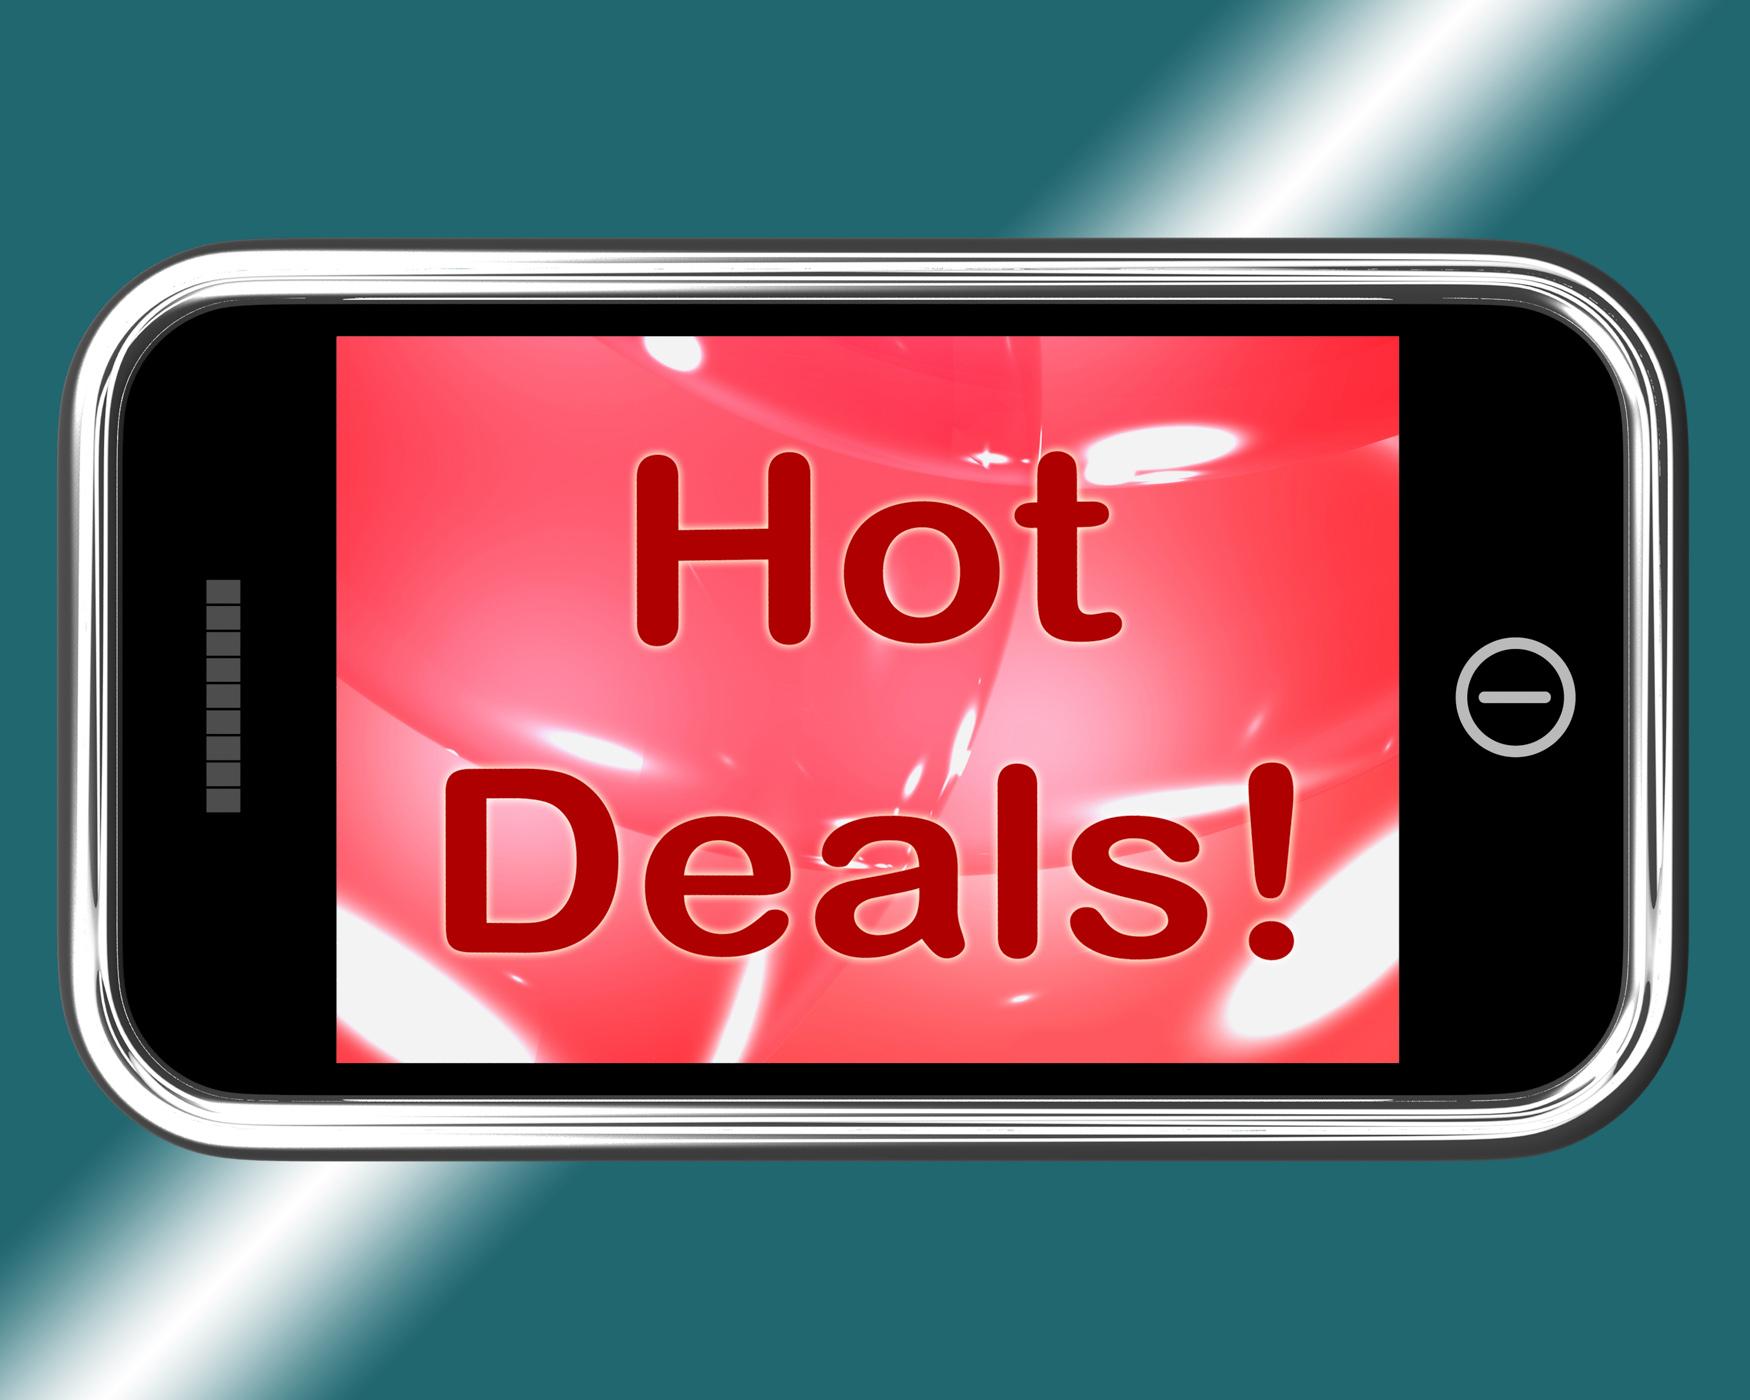 Hot deals mobile message represents discounts online photo